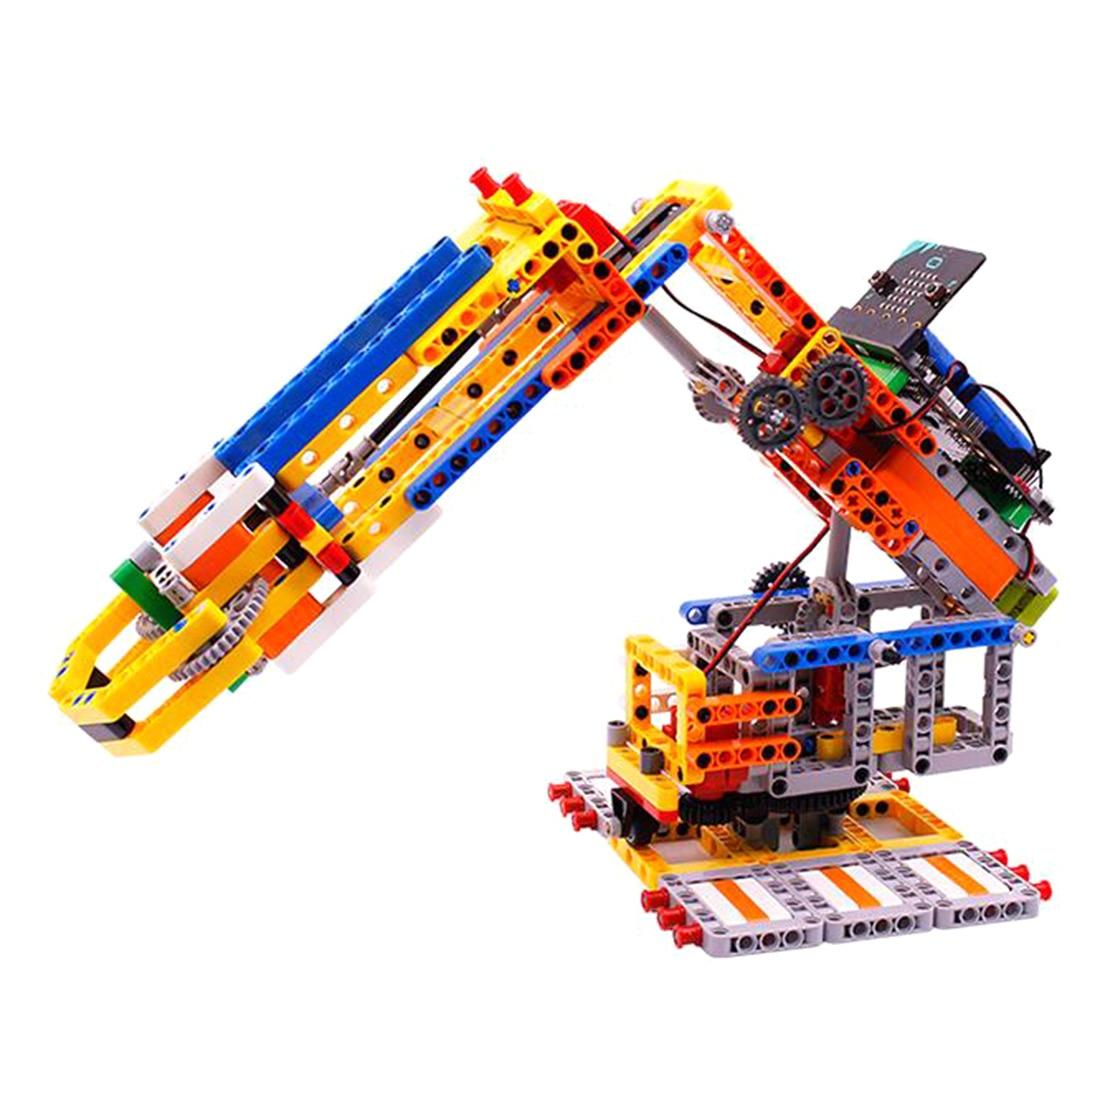 Hot Sale Micro:Bit Programmable Building Block DIY Smart Robotic Arm Kit Learning Kit Programmable Dancing Robot Electronic Toy